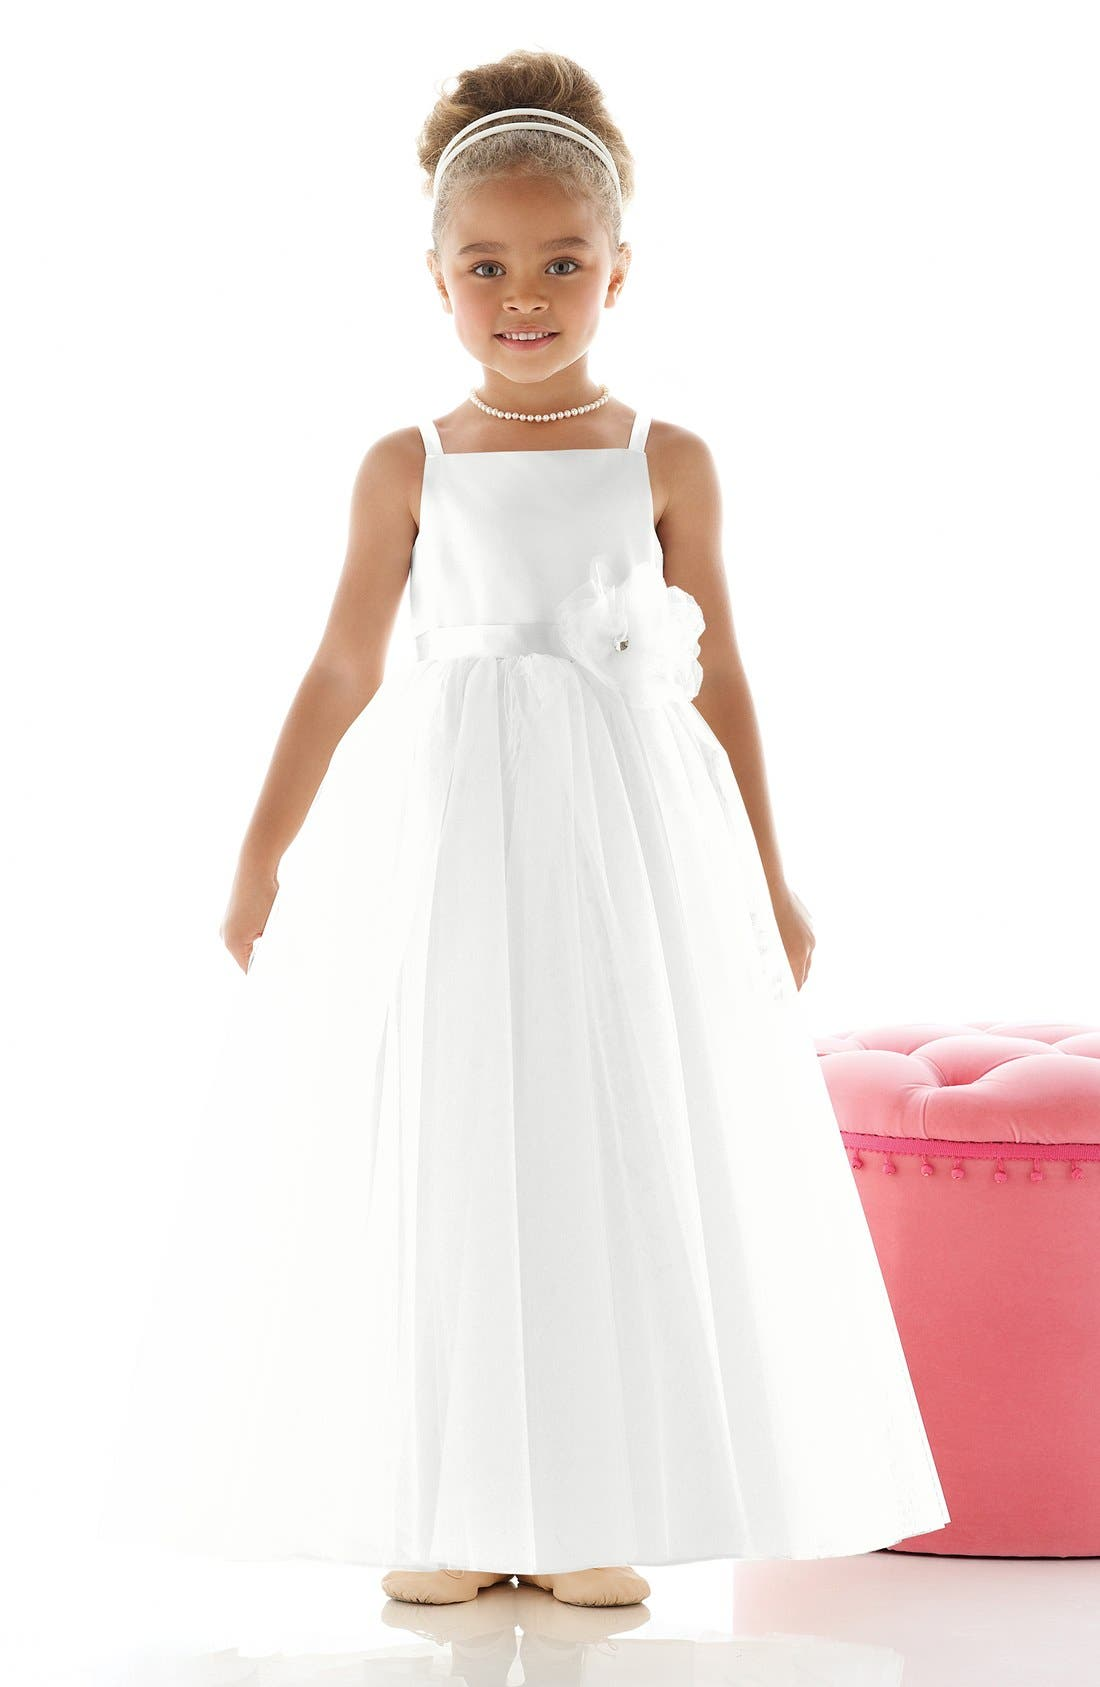 Dessy Collection 'Rose' Satin & Tulle Flower Girl Dress (Toddler, Little Girls & Big Girls)